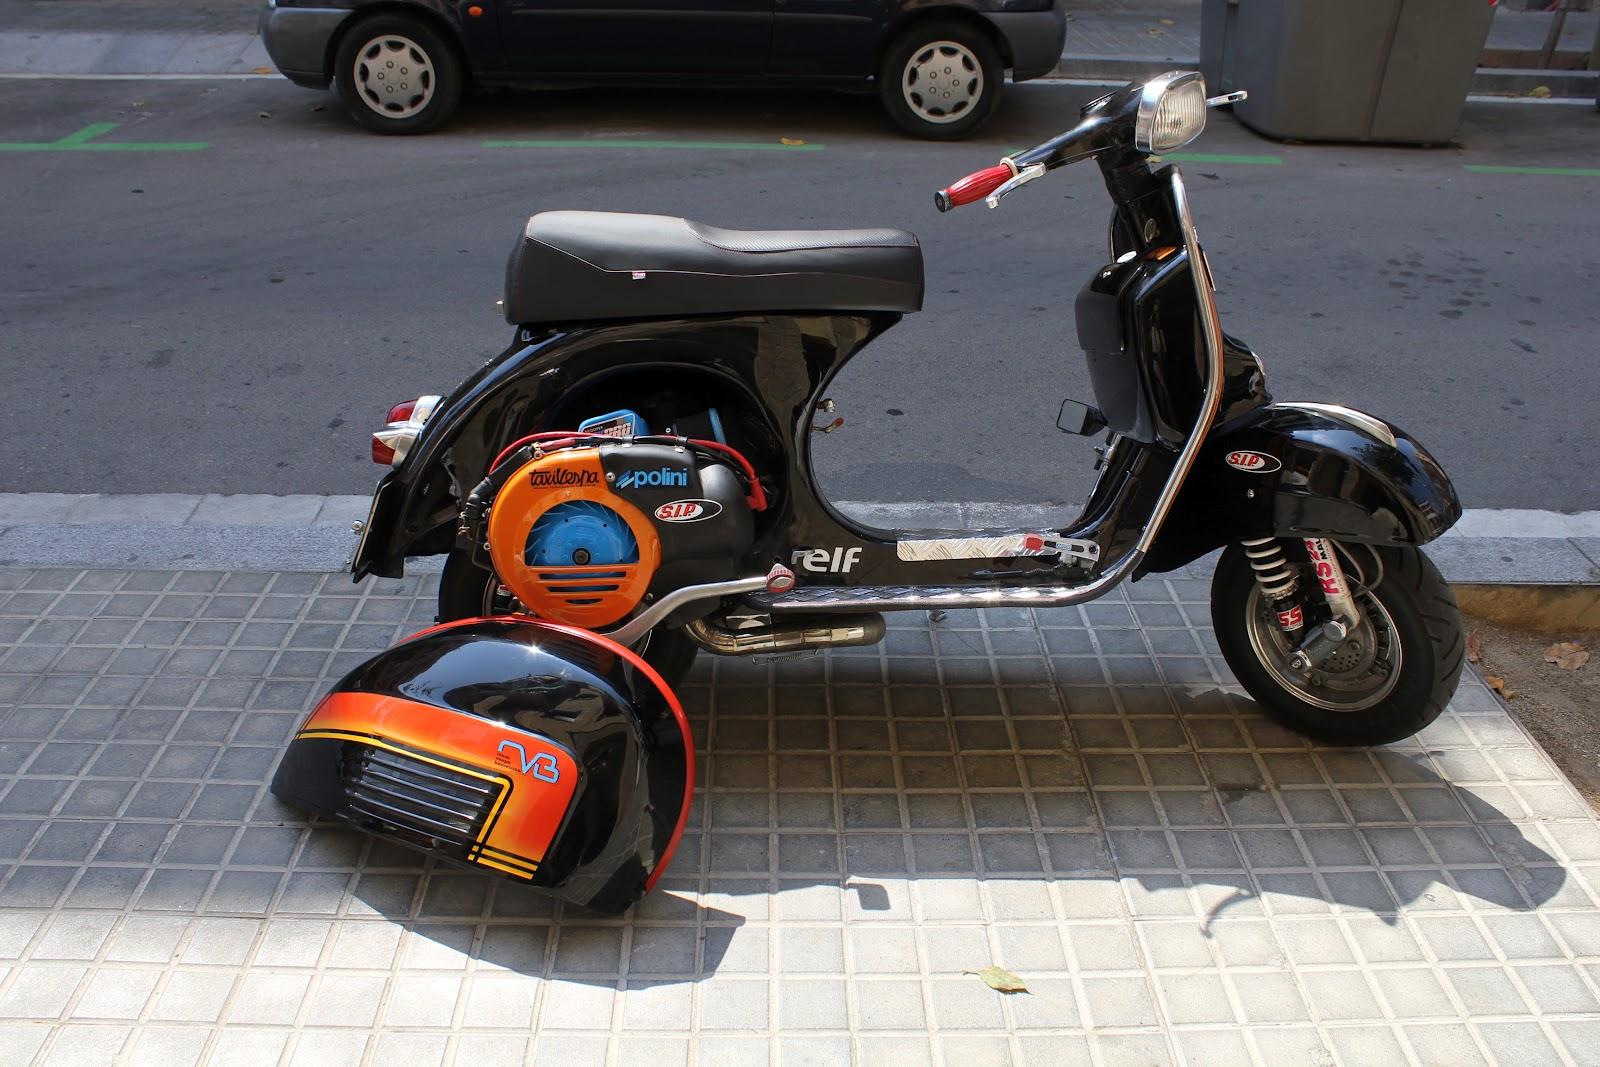 Tapizar asiento moto en barcelona septiembre 2012 for Tapizar asiento moto madrid